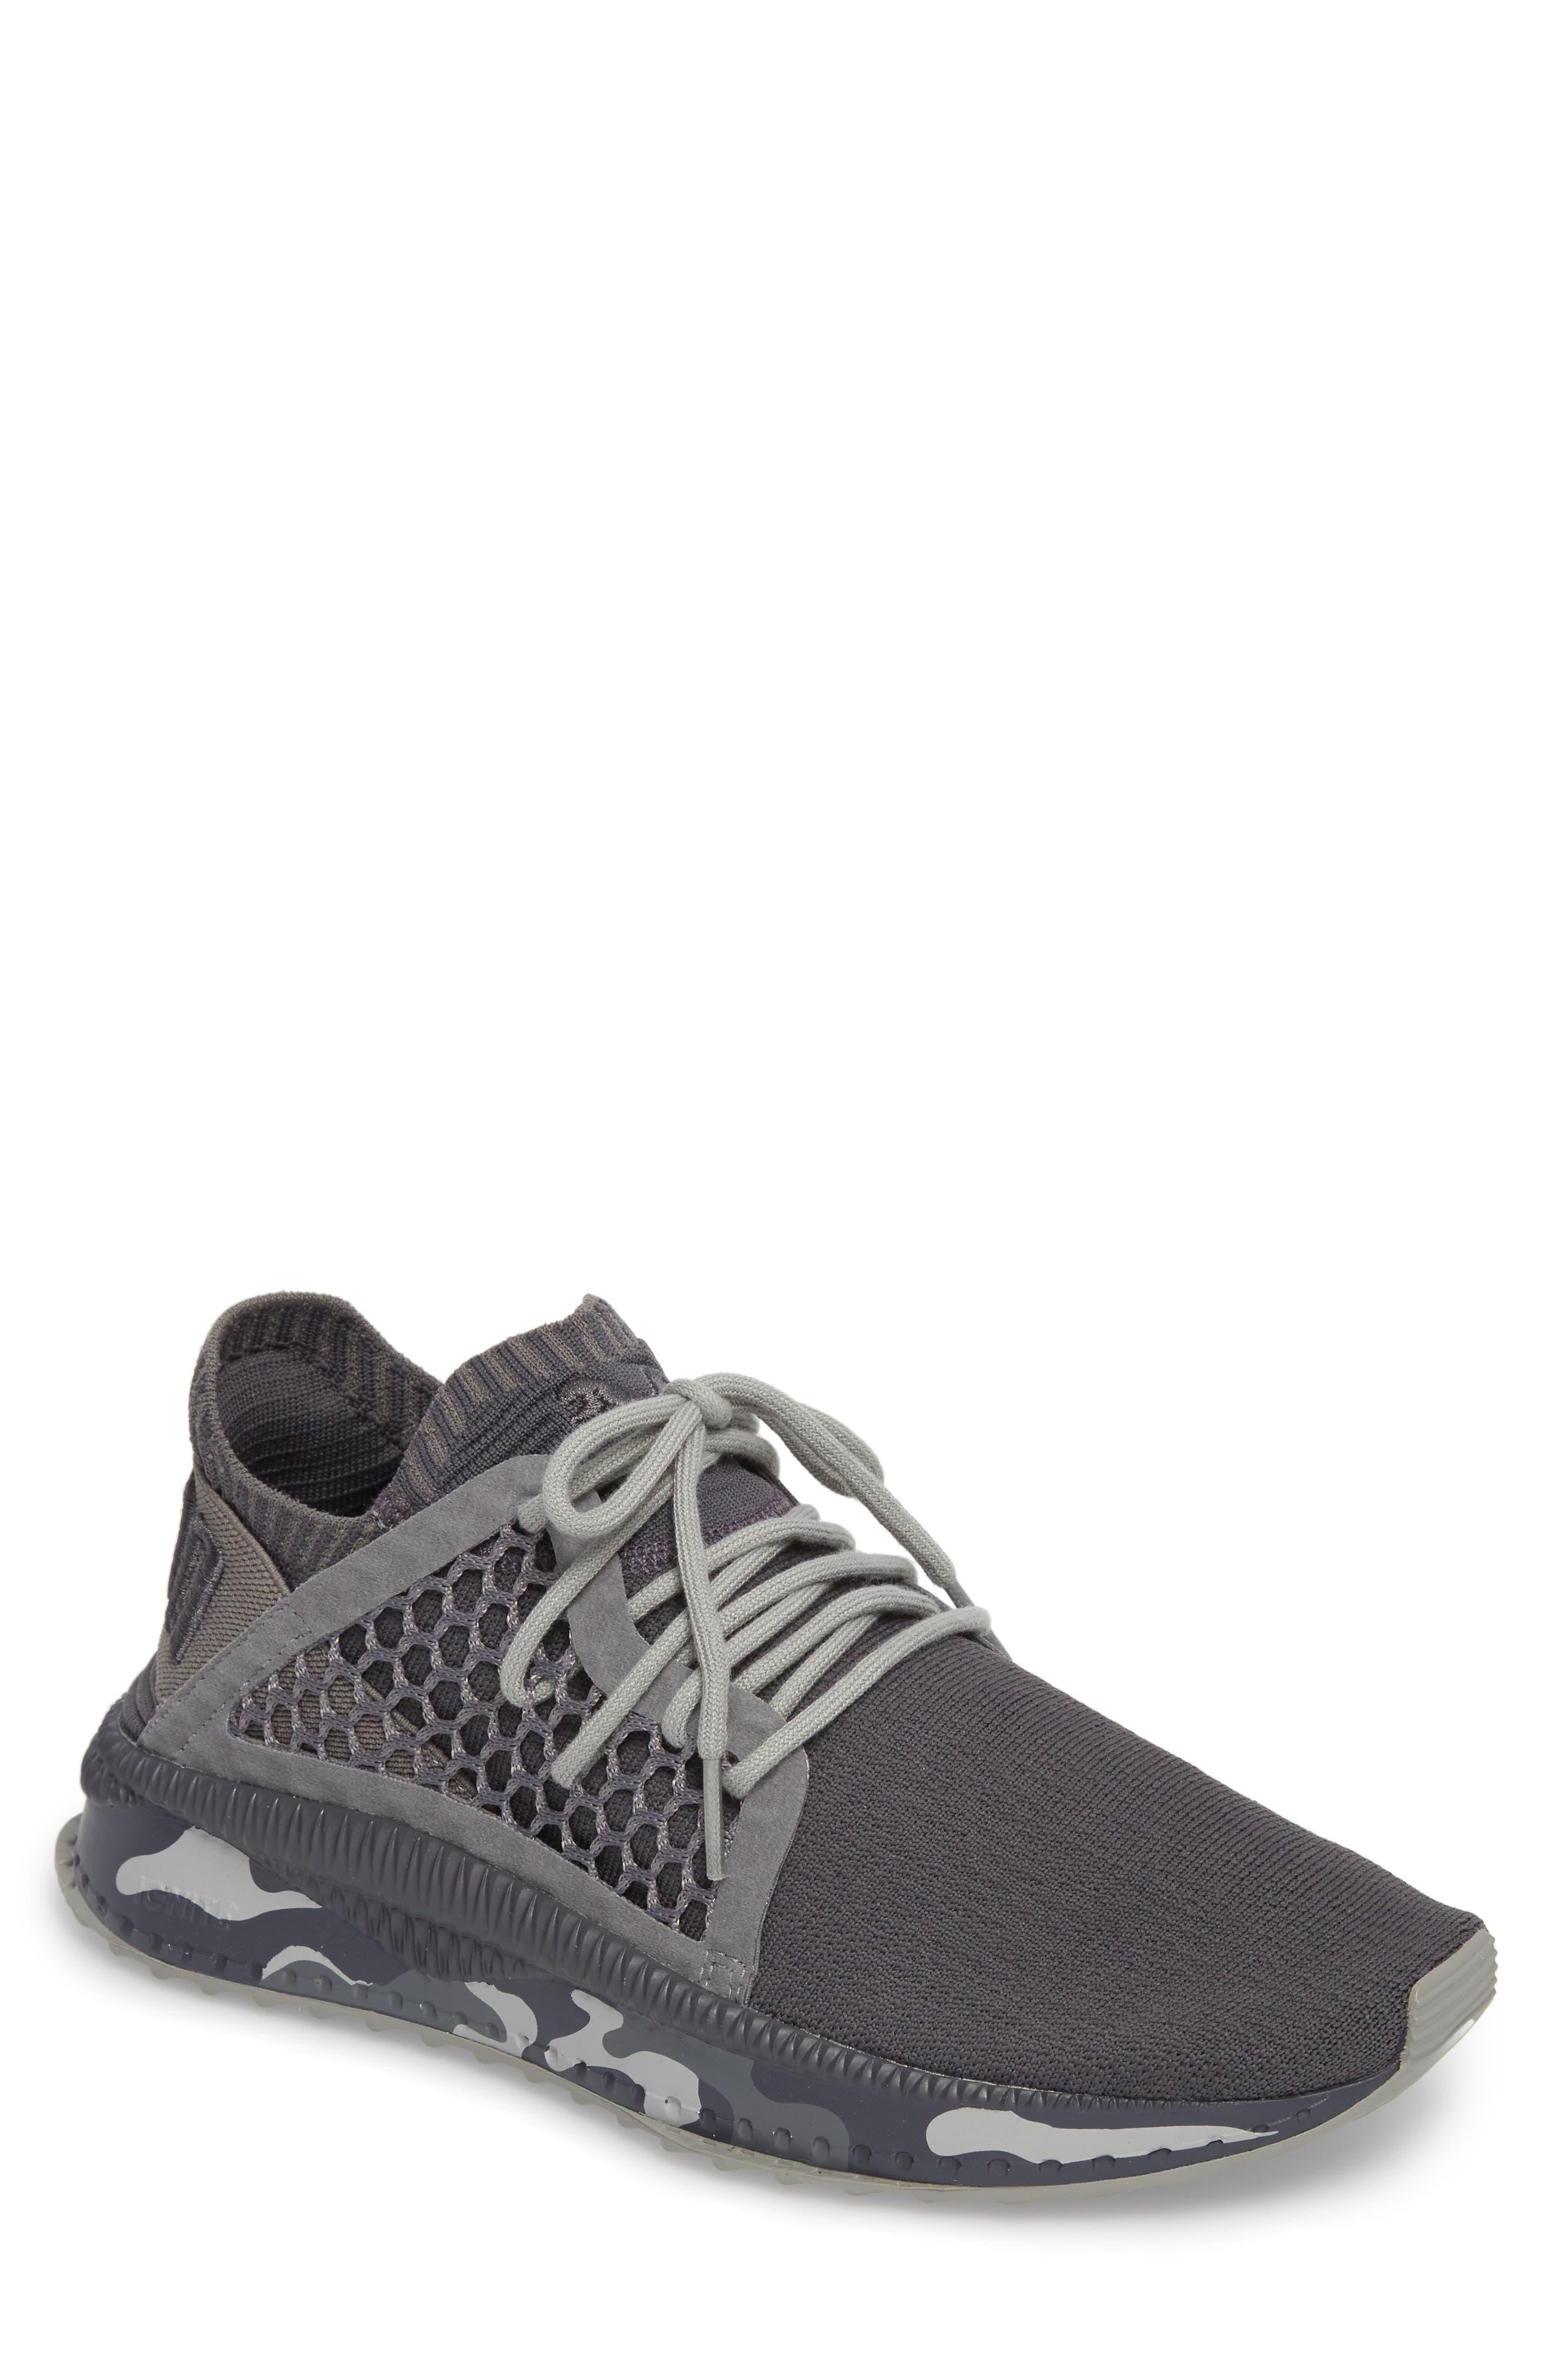 Tsugi Netfit evoKNIT Training Shoe,                         Main,                         color, Quiet Shade-Asphalt